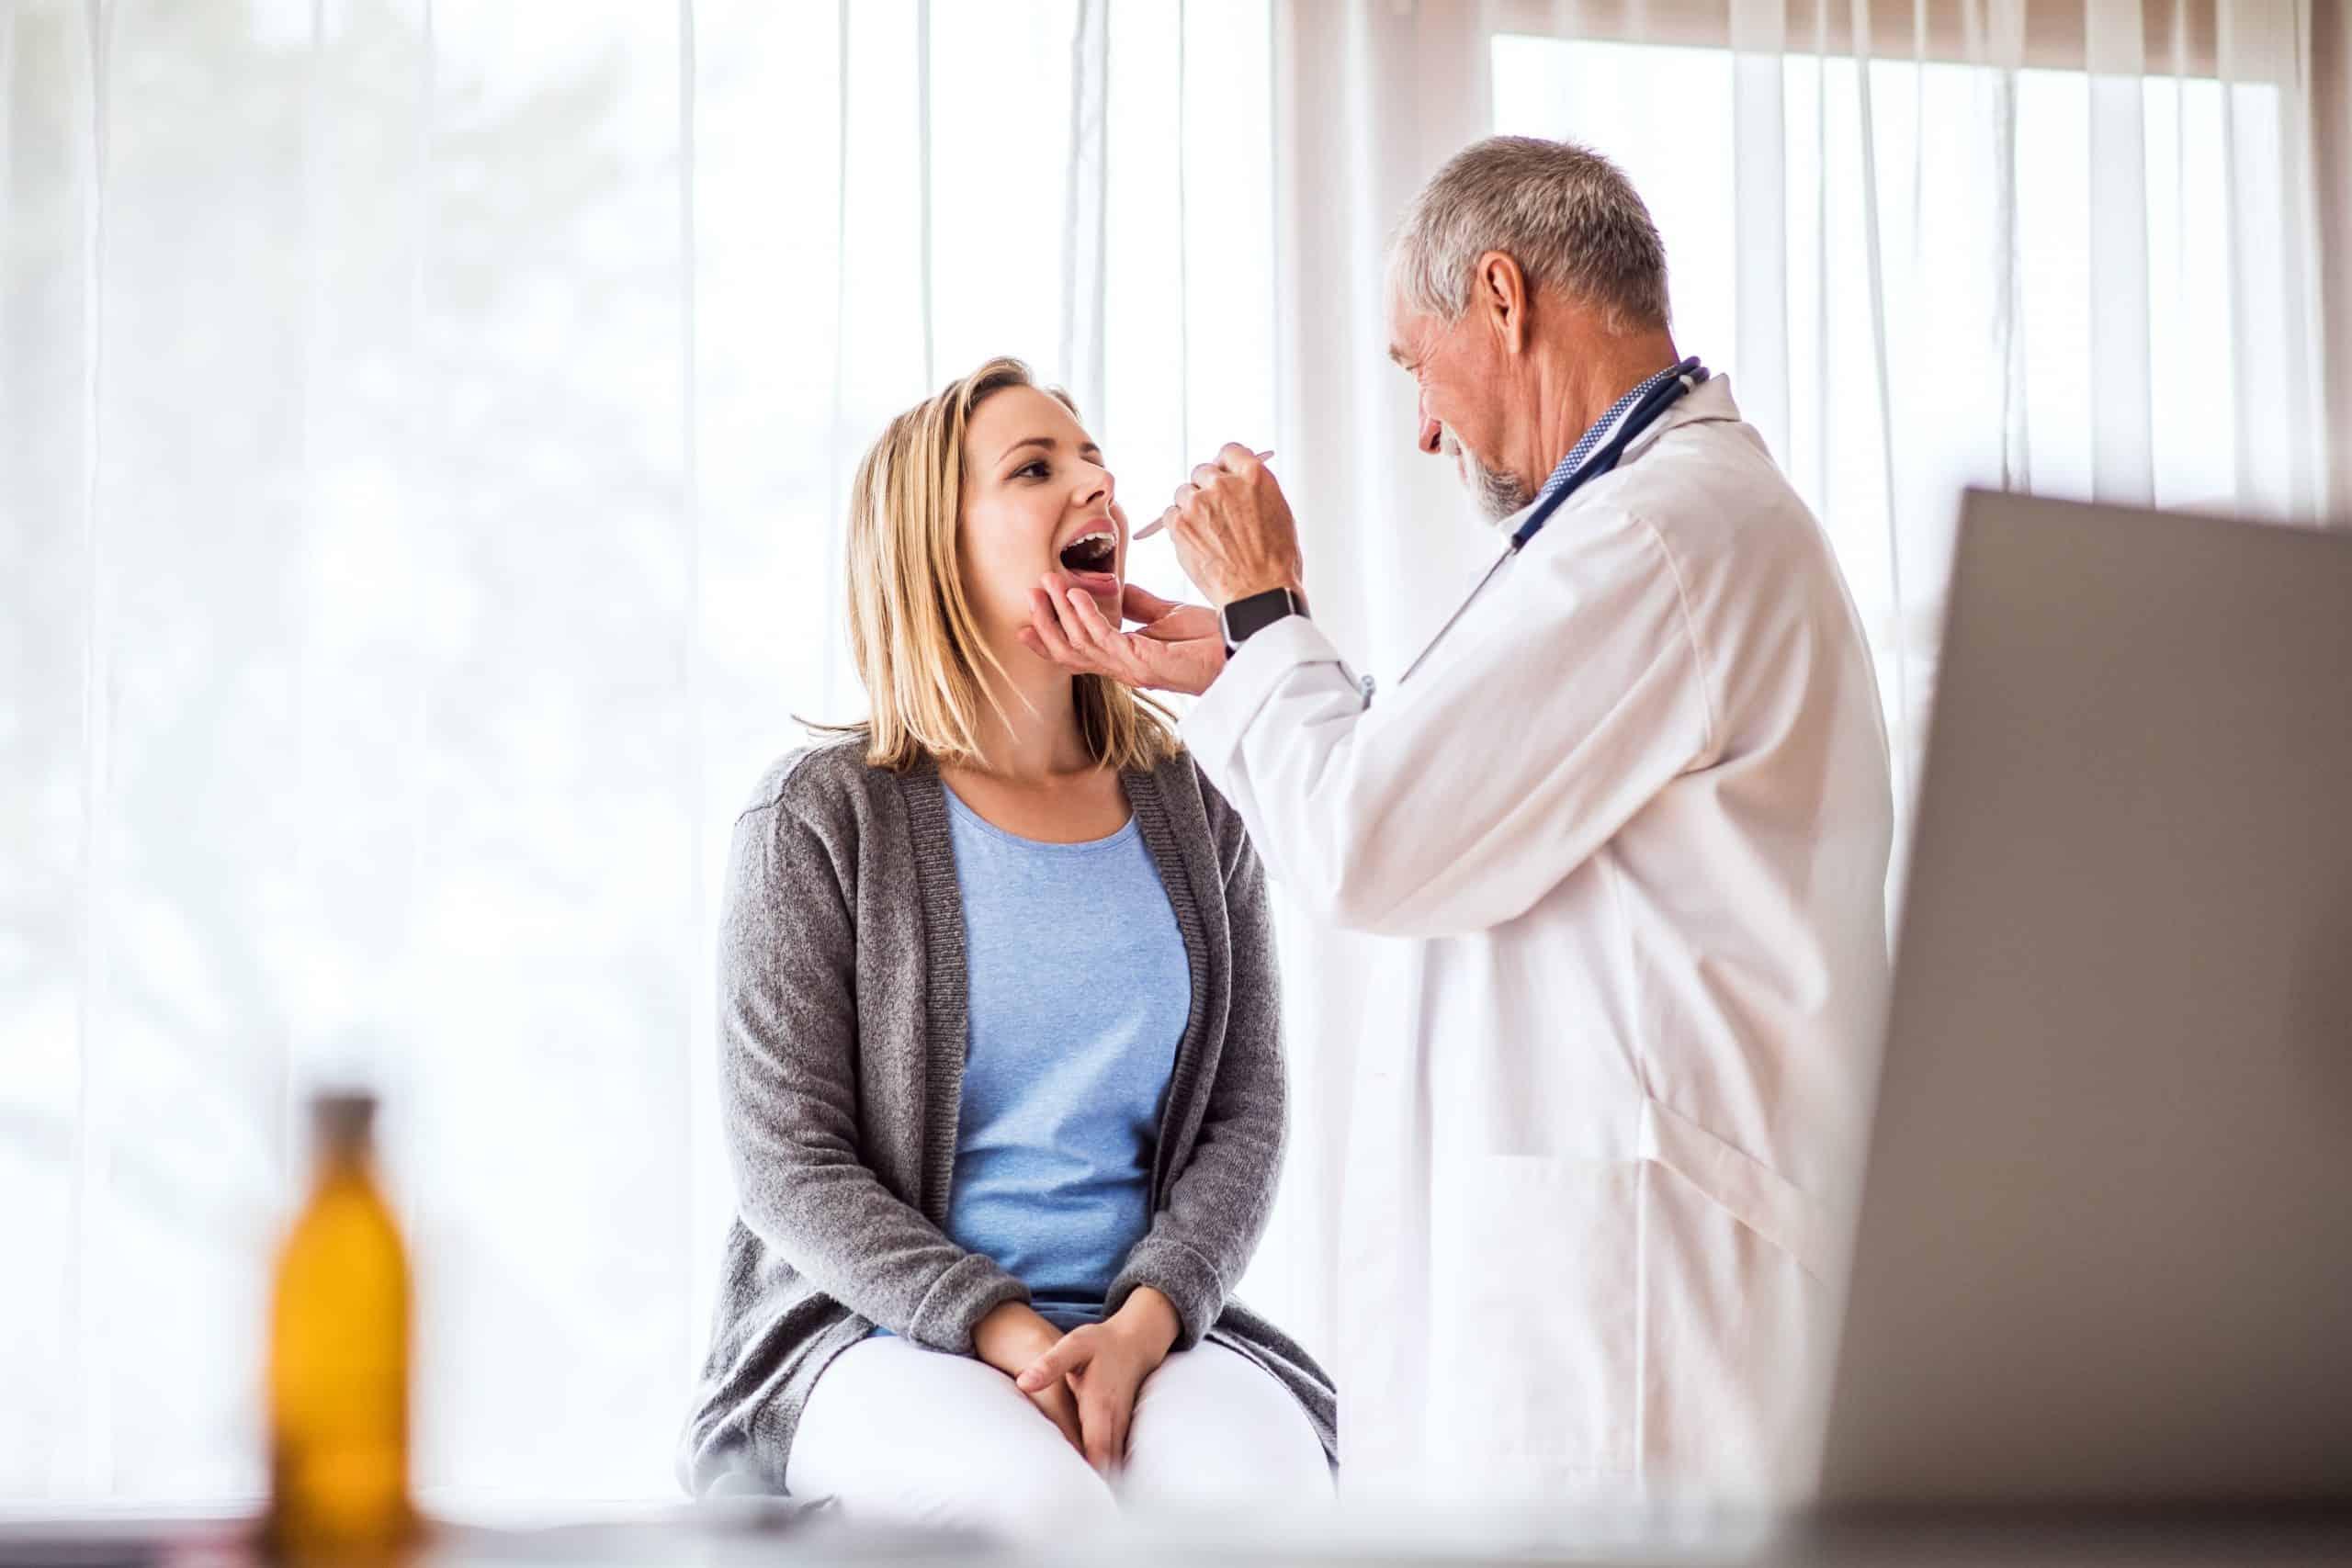 #1 Pharmacy Mini Clinic Annual Checkup